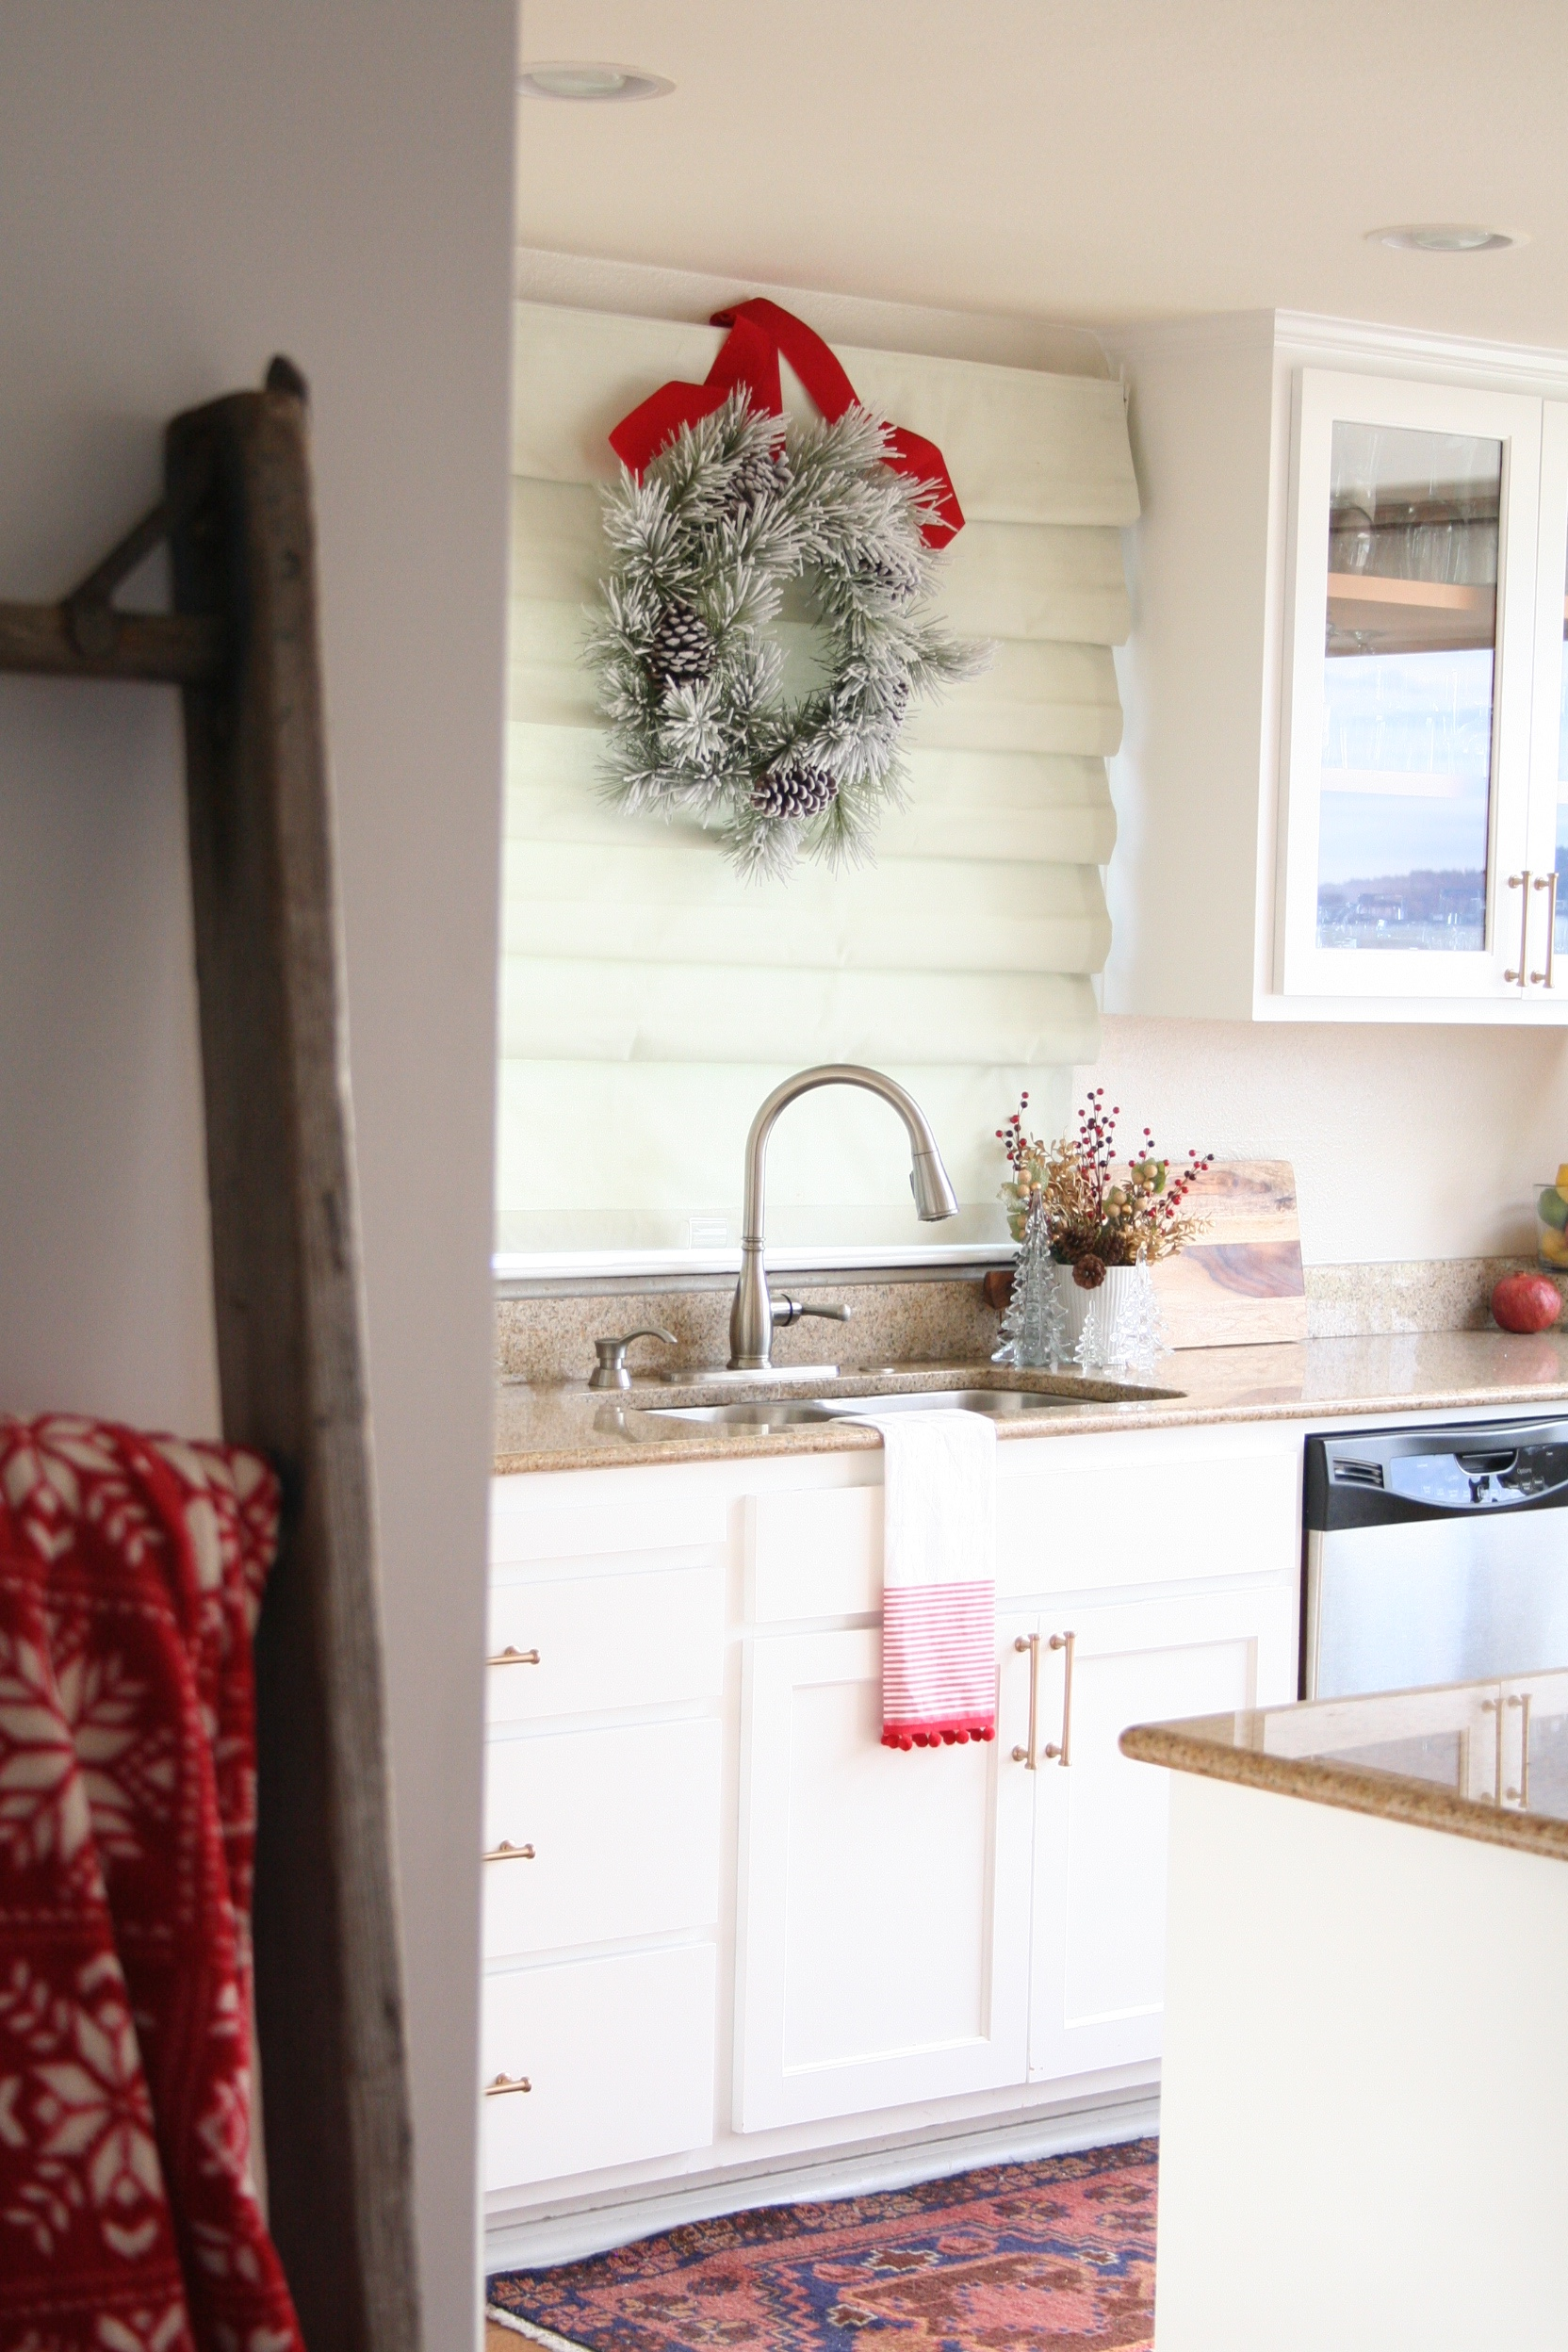 Christmas Kitchen Wreath over Sink